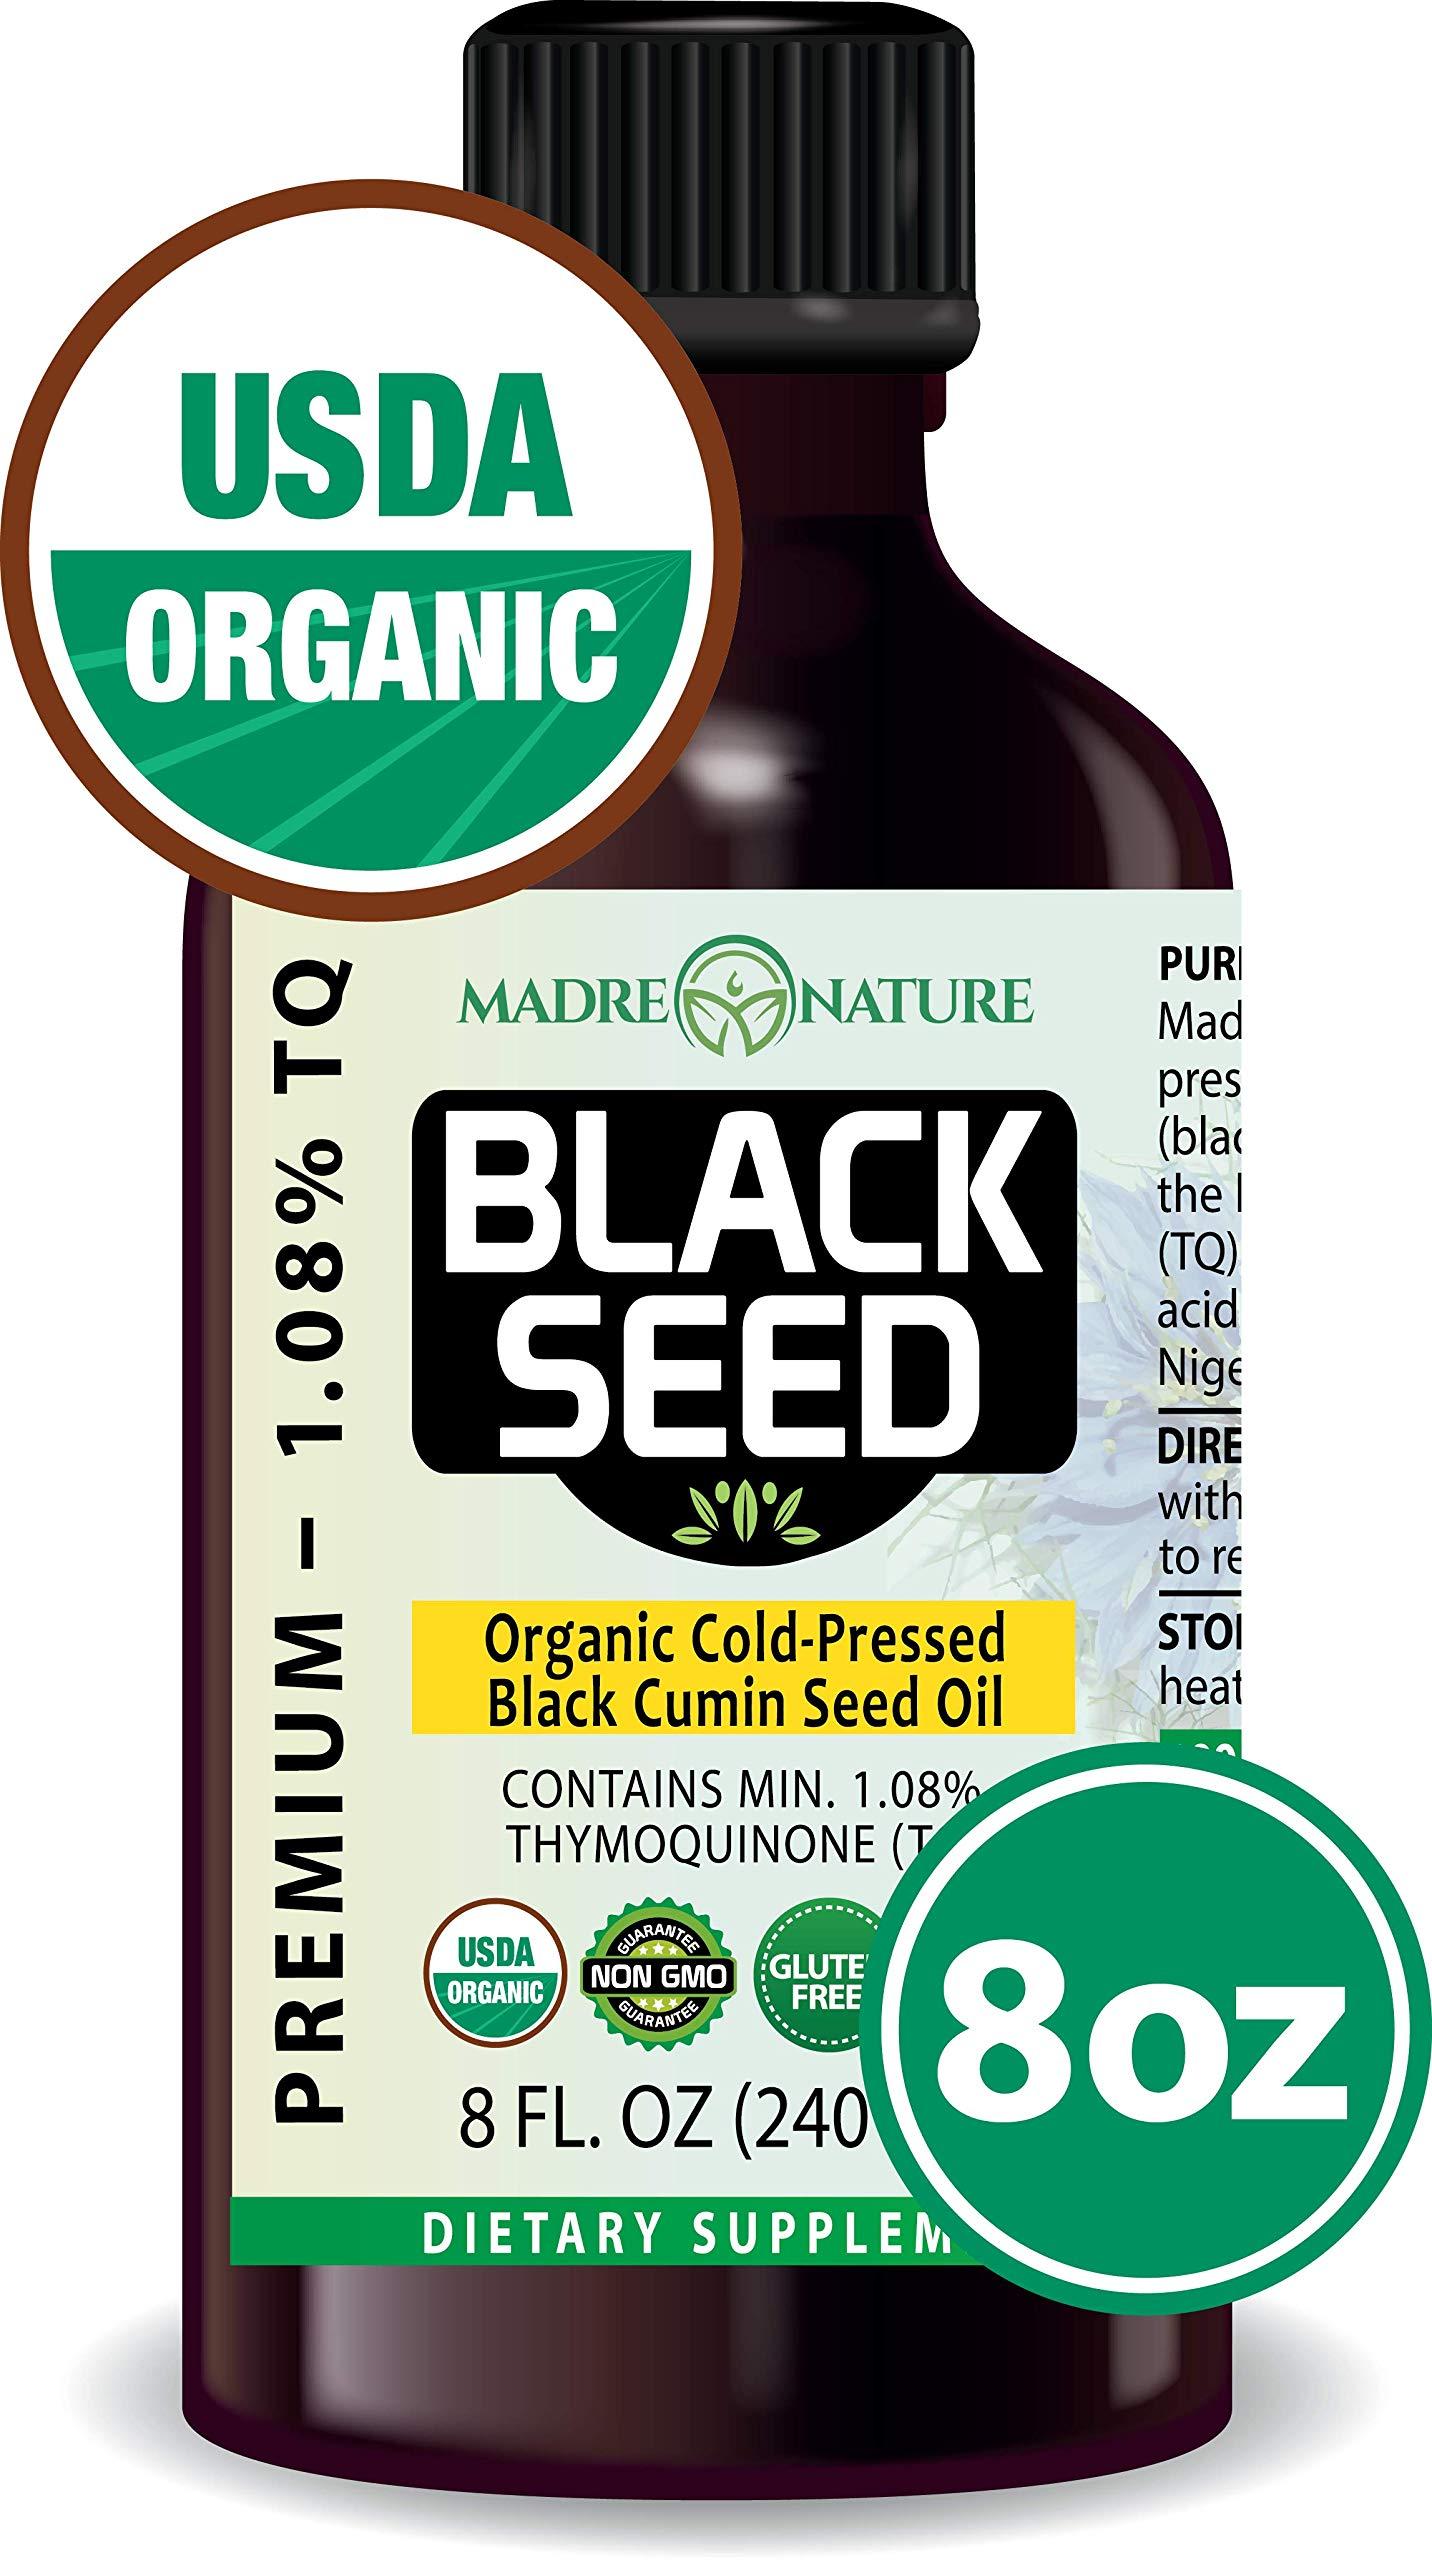 100% USDA Organic Certified Premium Black Cumin Seed Oil | GLASS BOTTLE | Darkest, Highest TQ 1.08% | Nigella Sativa | Undiluted | Cold Pressed, No Solvents | Certified Vegan, Non-GMO (8 ounce)